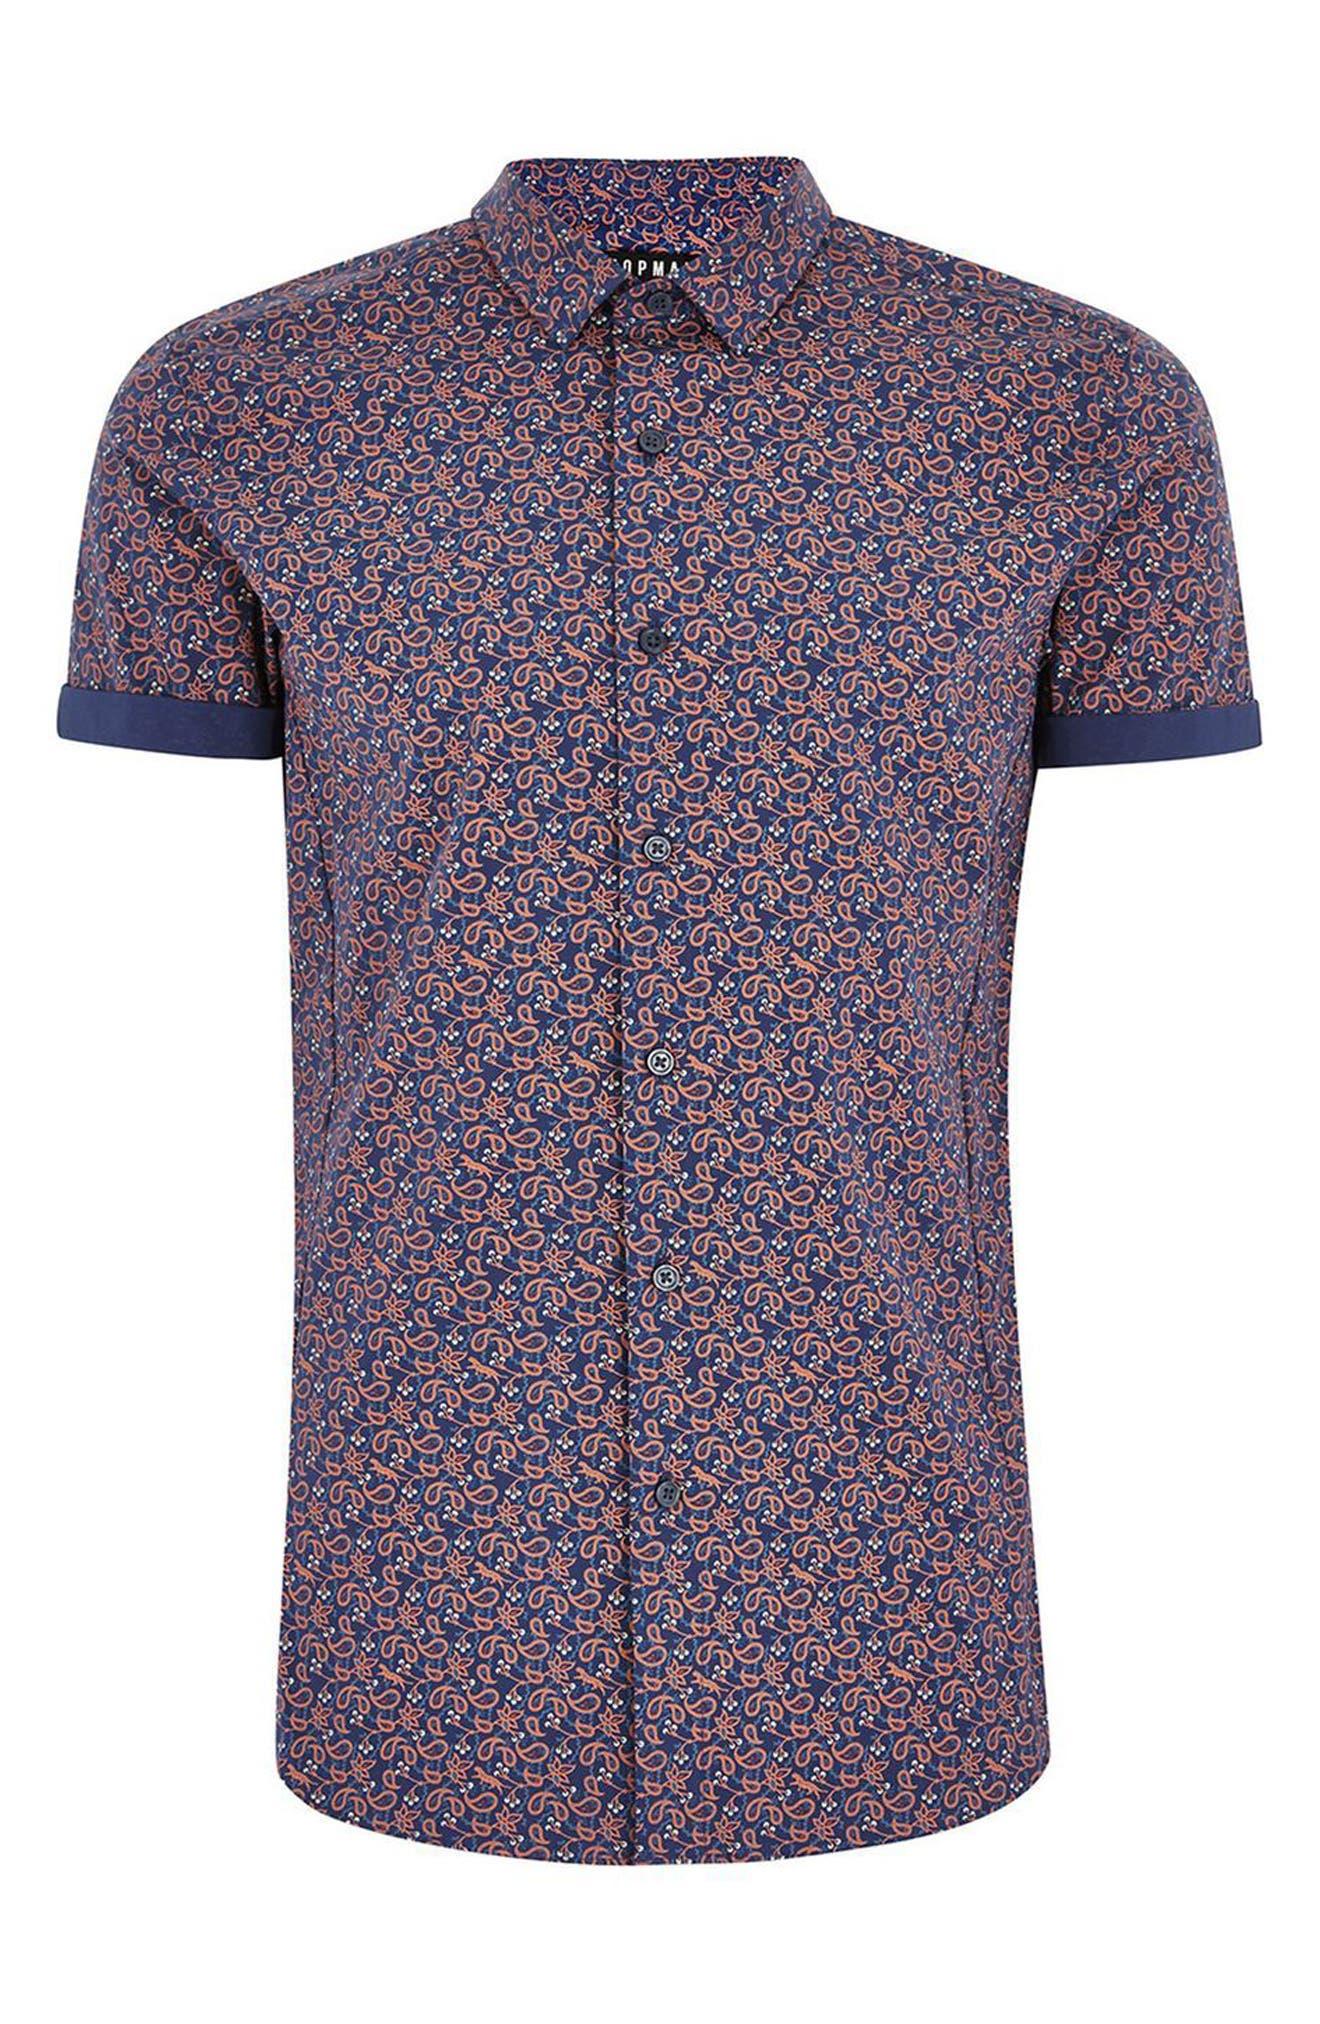 TOPMAN,                             Muscle Fit Eclectic Paisley Print Shirt,                             Alternate thumbnail 4, color,                             400